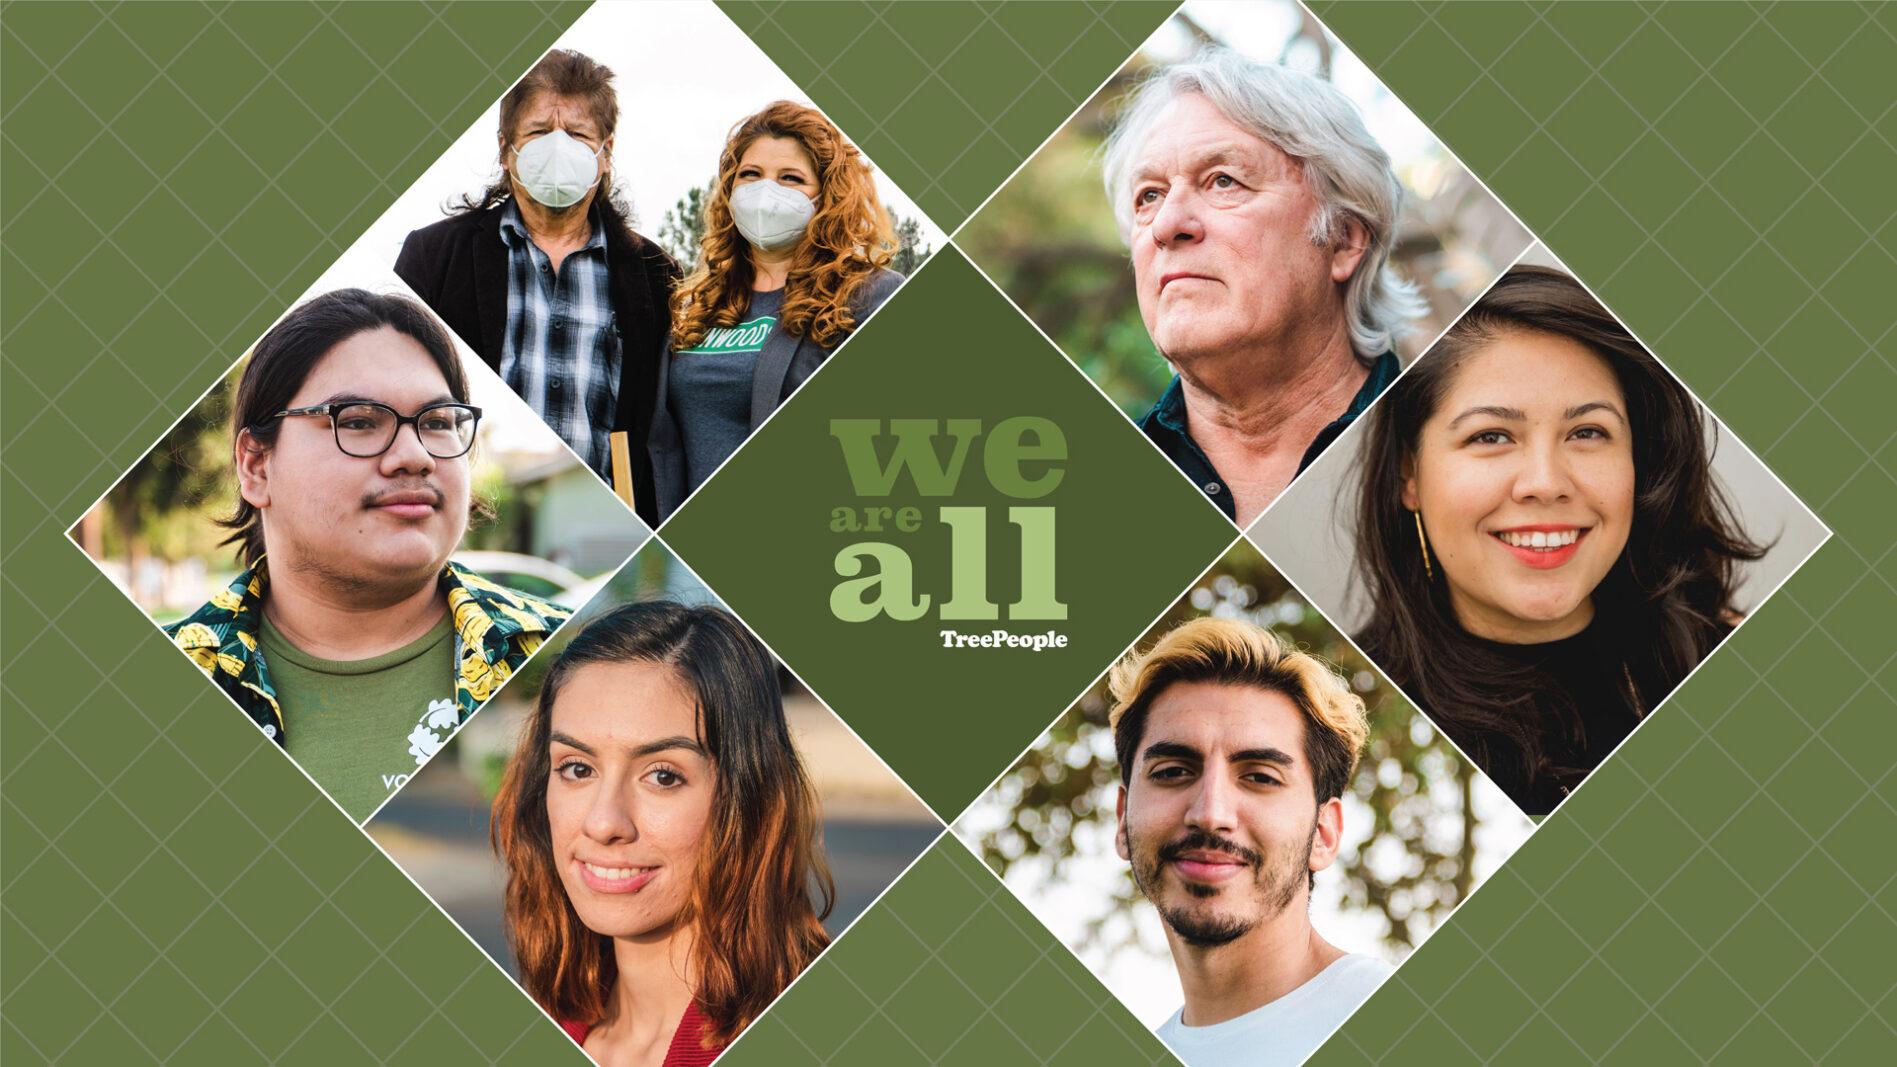 Header Homepage - We Are All TreePeople - February